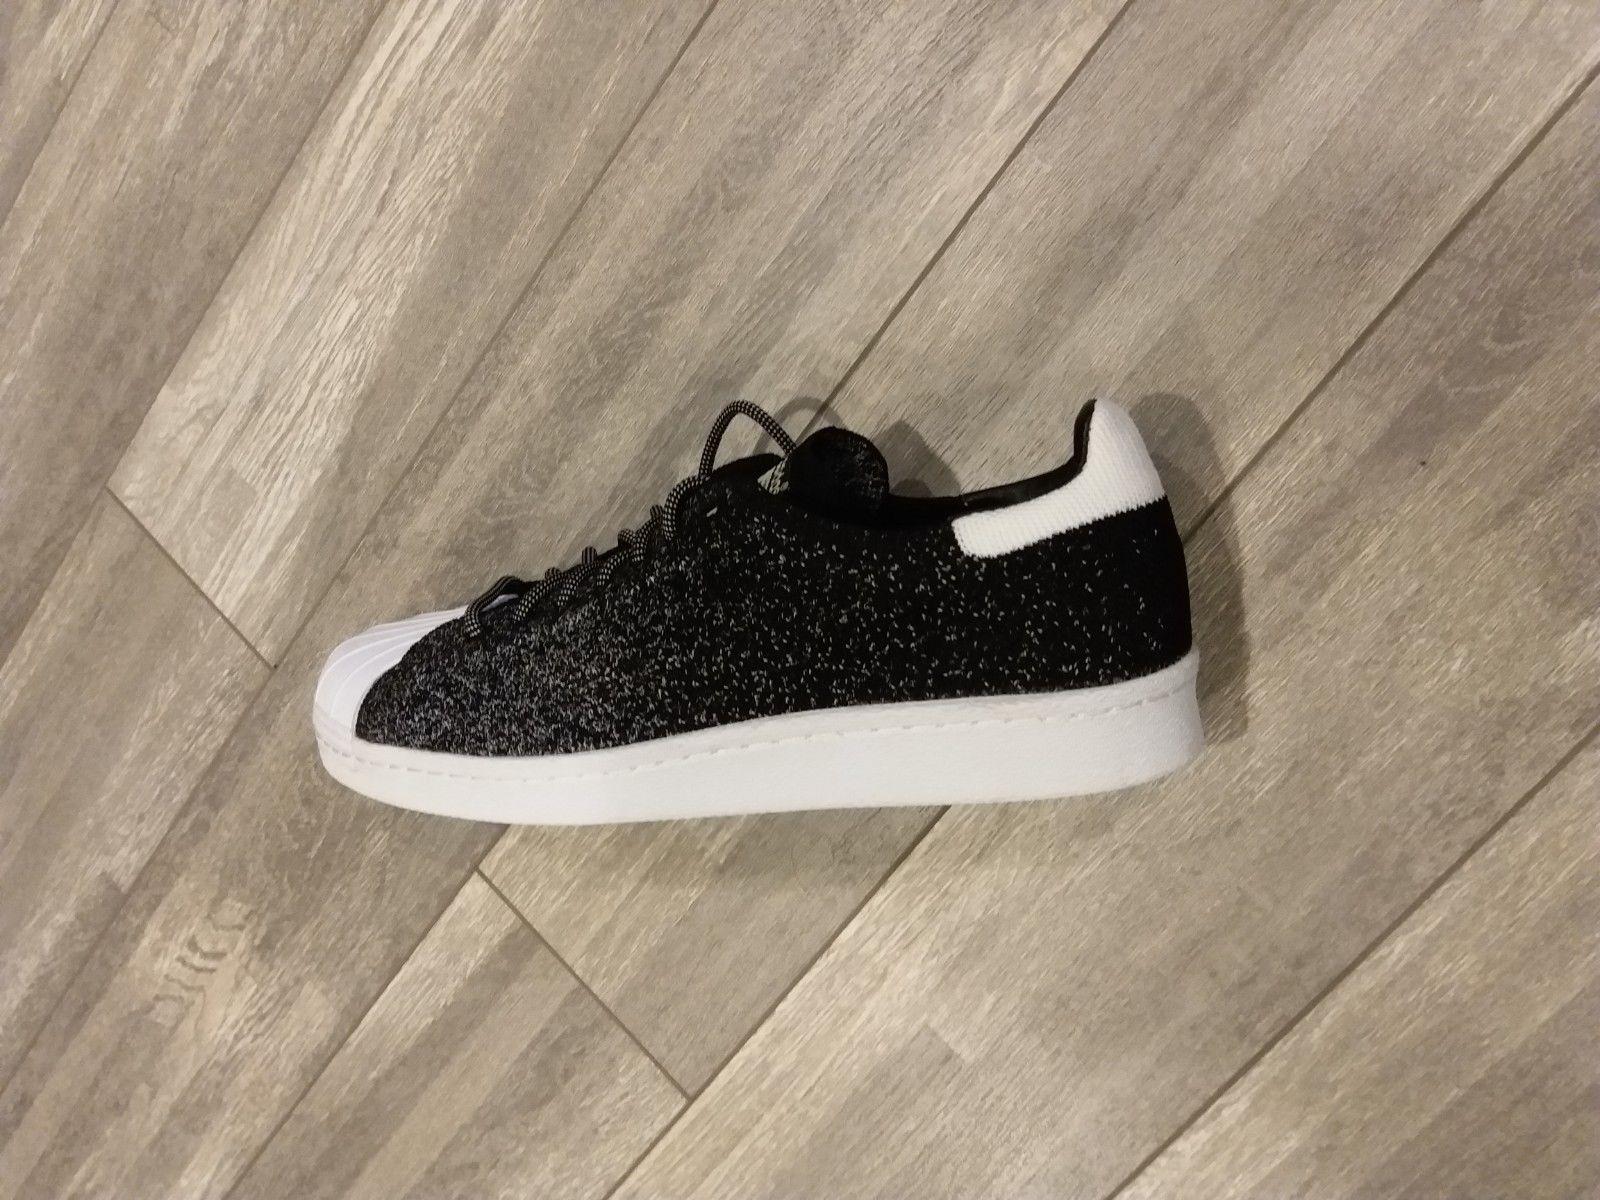 79b20a1ddb68 Adidas Superstar 80s PK ASG Primeknit Black and 45 similar items. 57